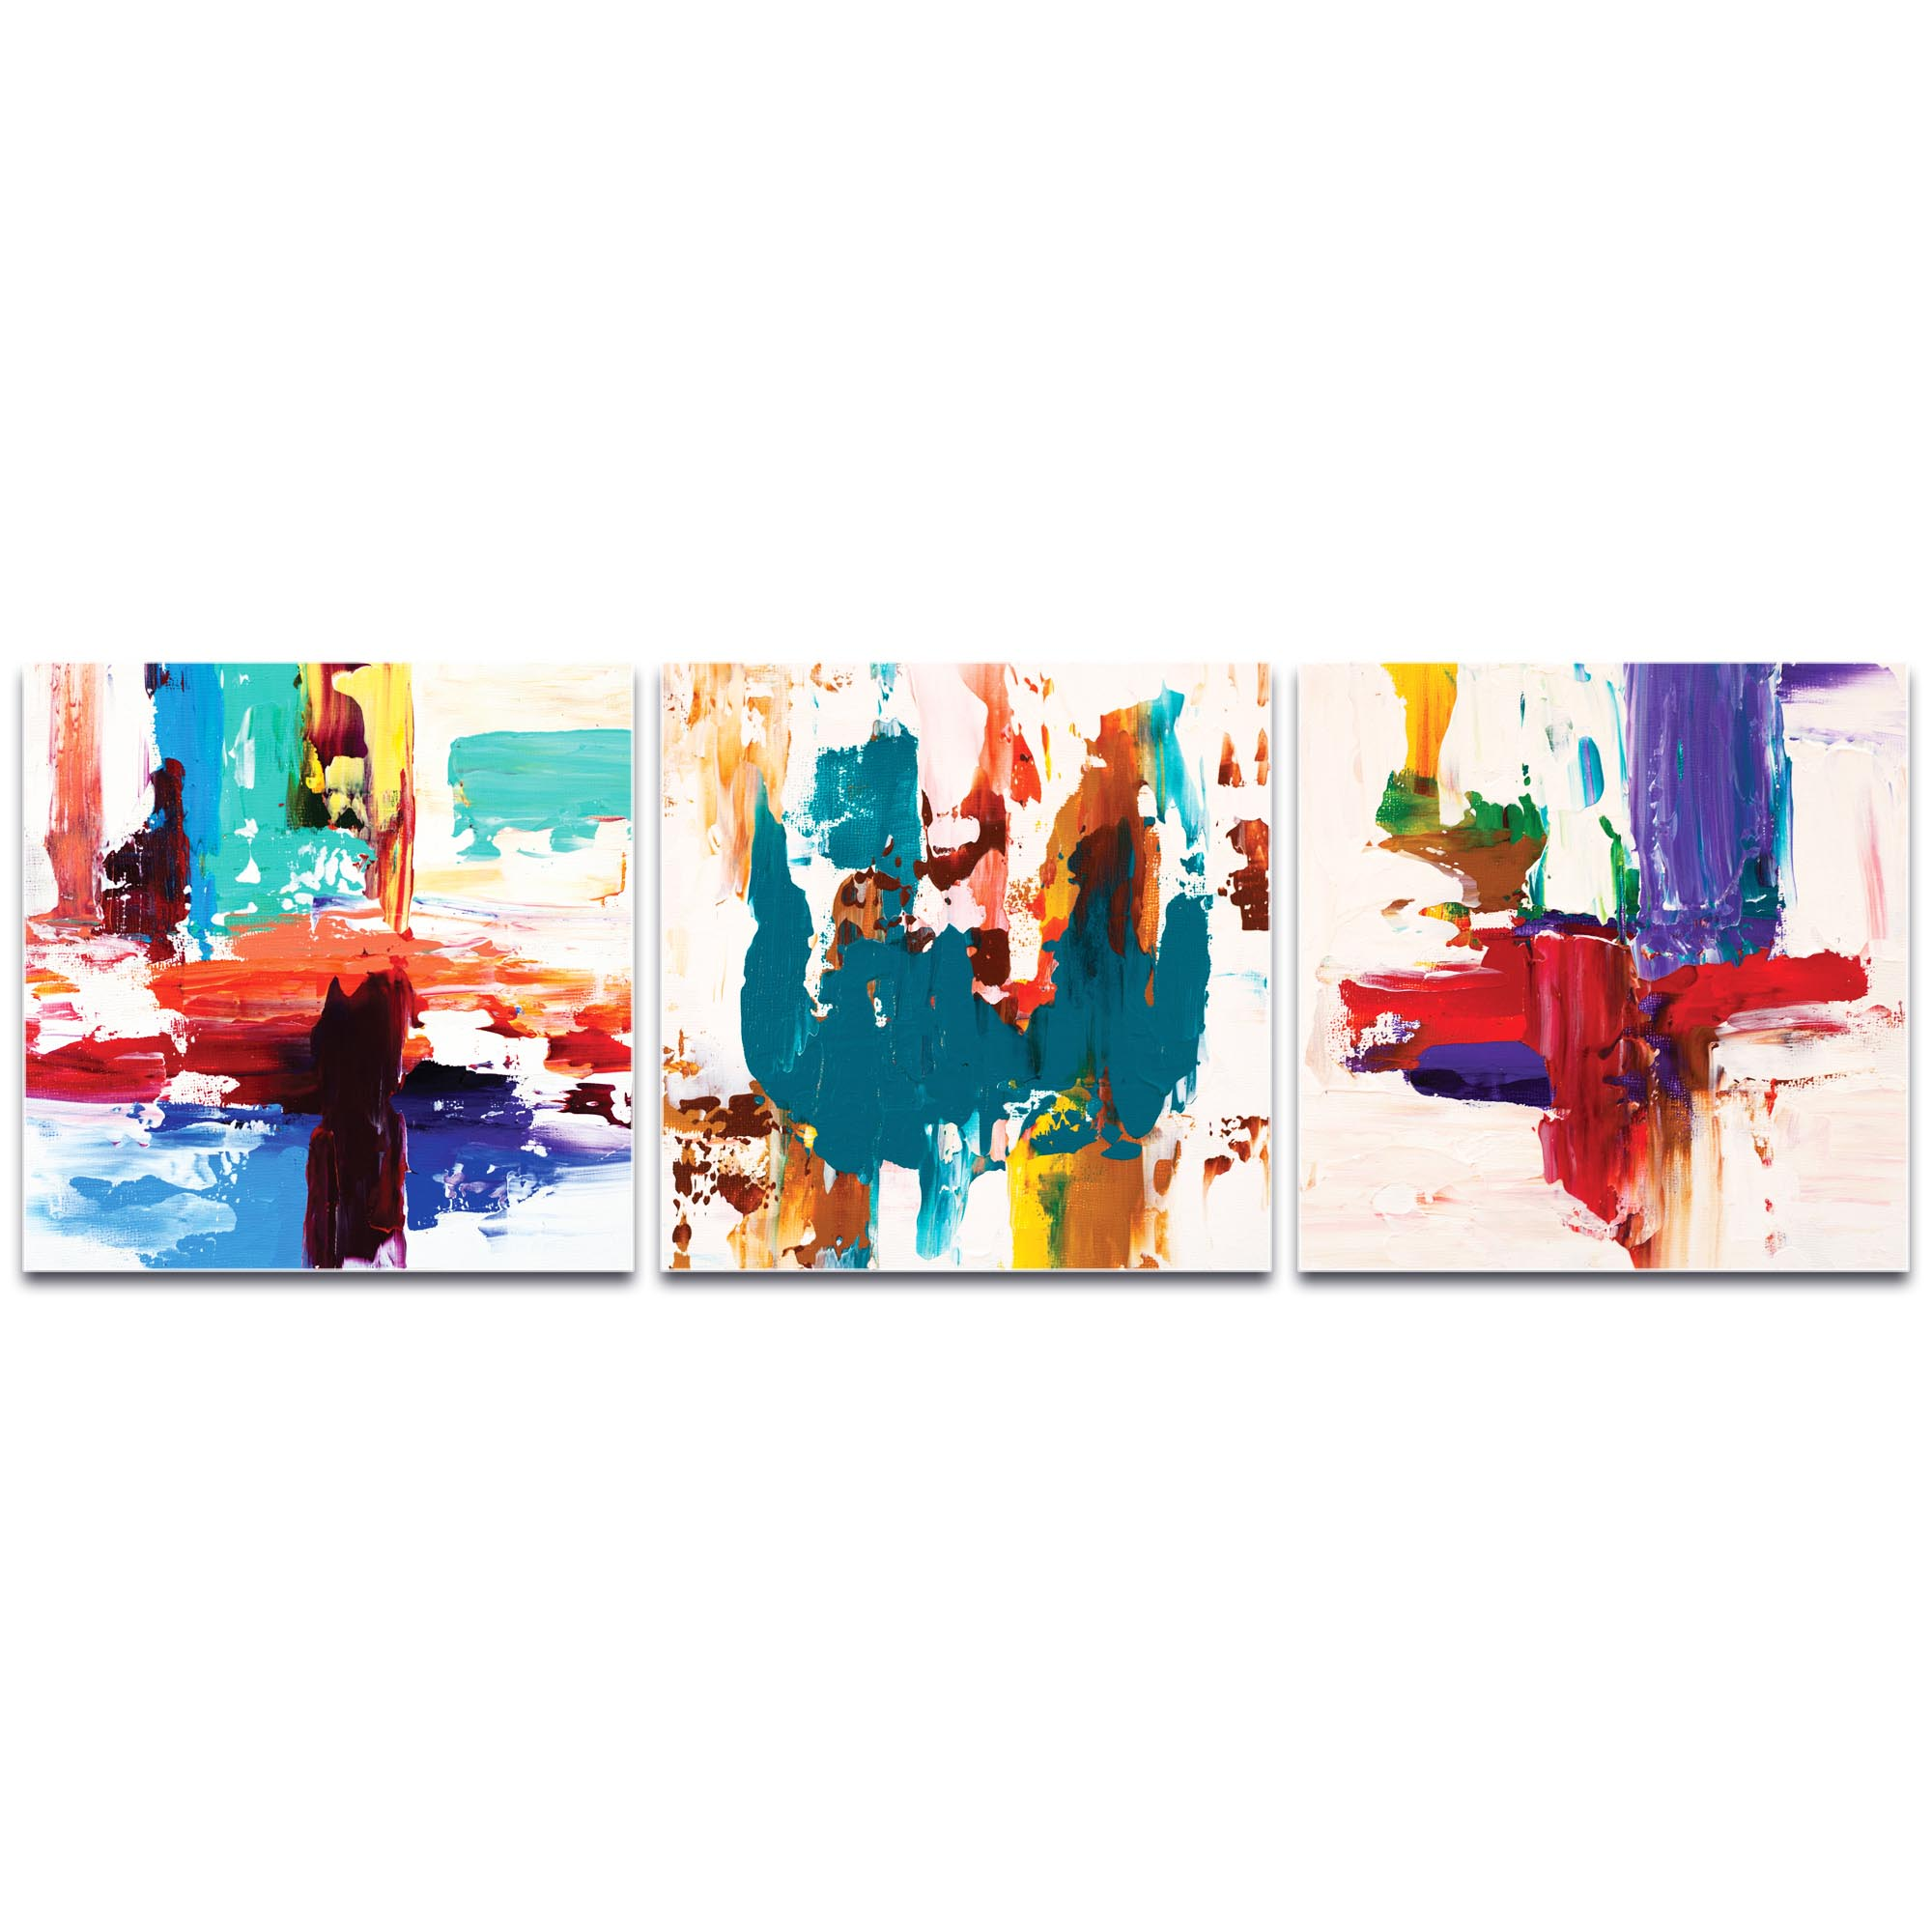 Abstract Wall Art 'Urban Triptych 2 Large' - Urban Decor on Metal or Plexiglass - Image 2